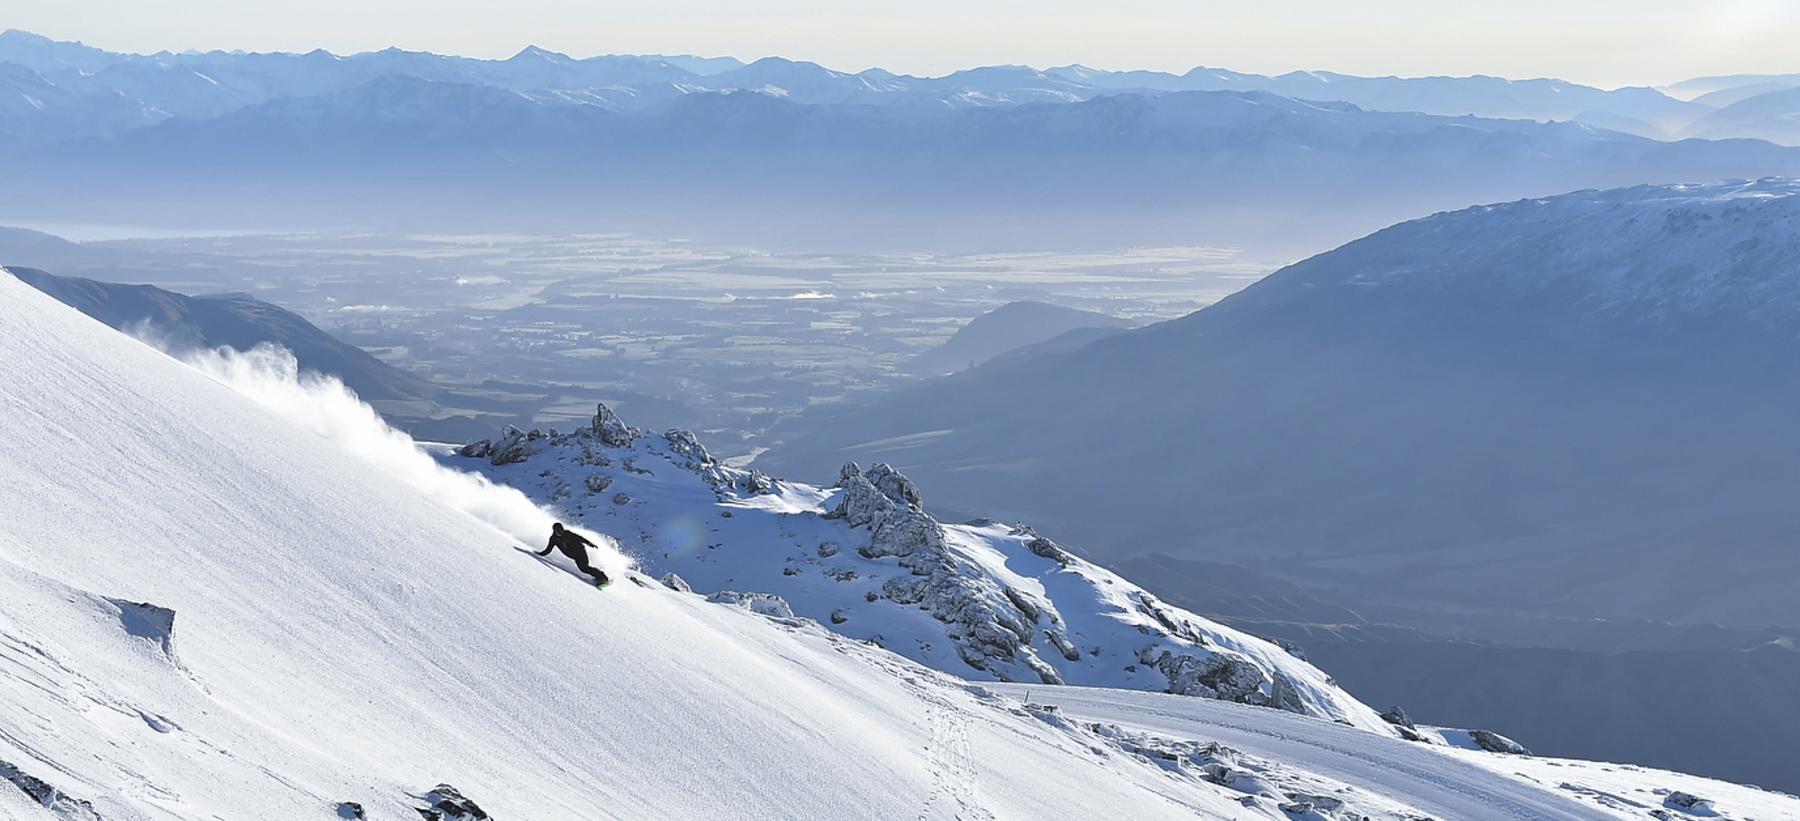 Snowboarder at Cardrona Alpine Resort